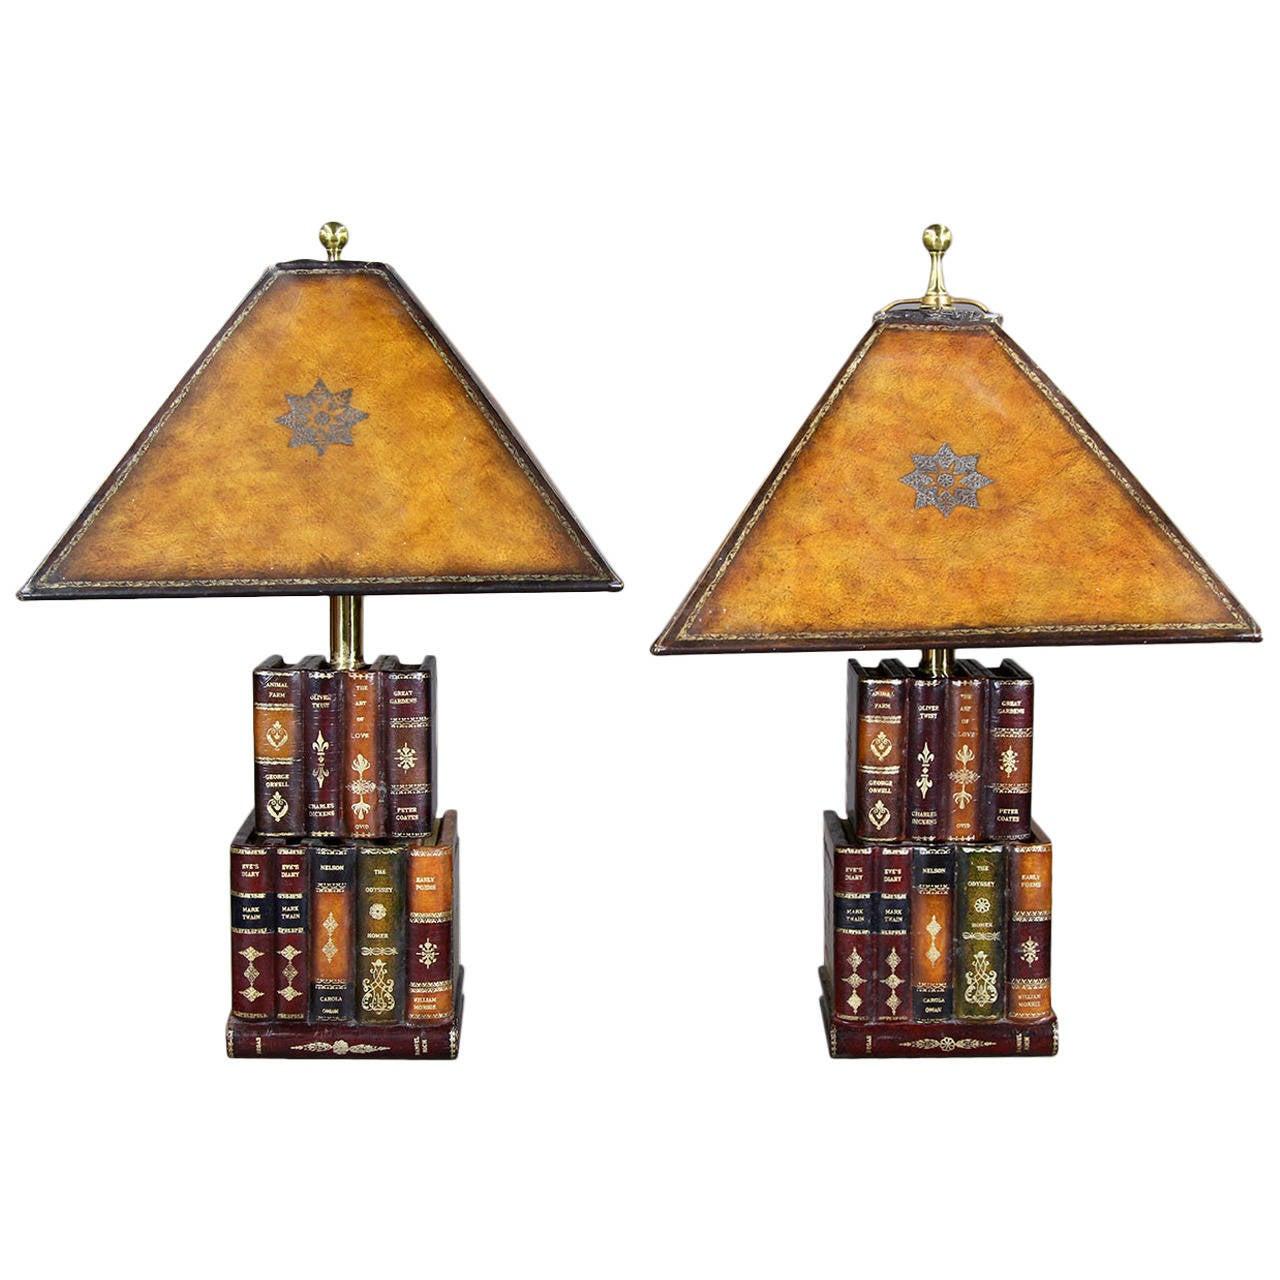 Pair of Maitland Smith Faux Book L&s 1  sc 1 st  1stDibs & Pair of Maitland Smith Faux Book Lamps at 1stdibs azcodes.com